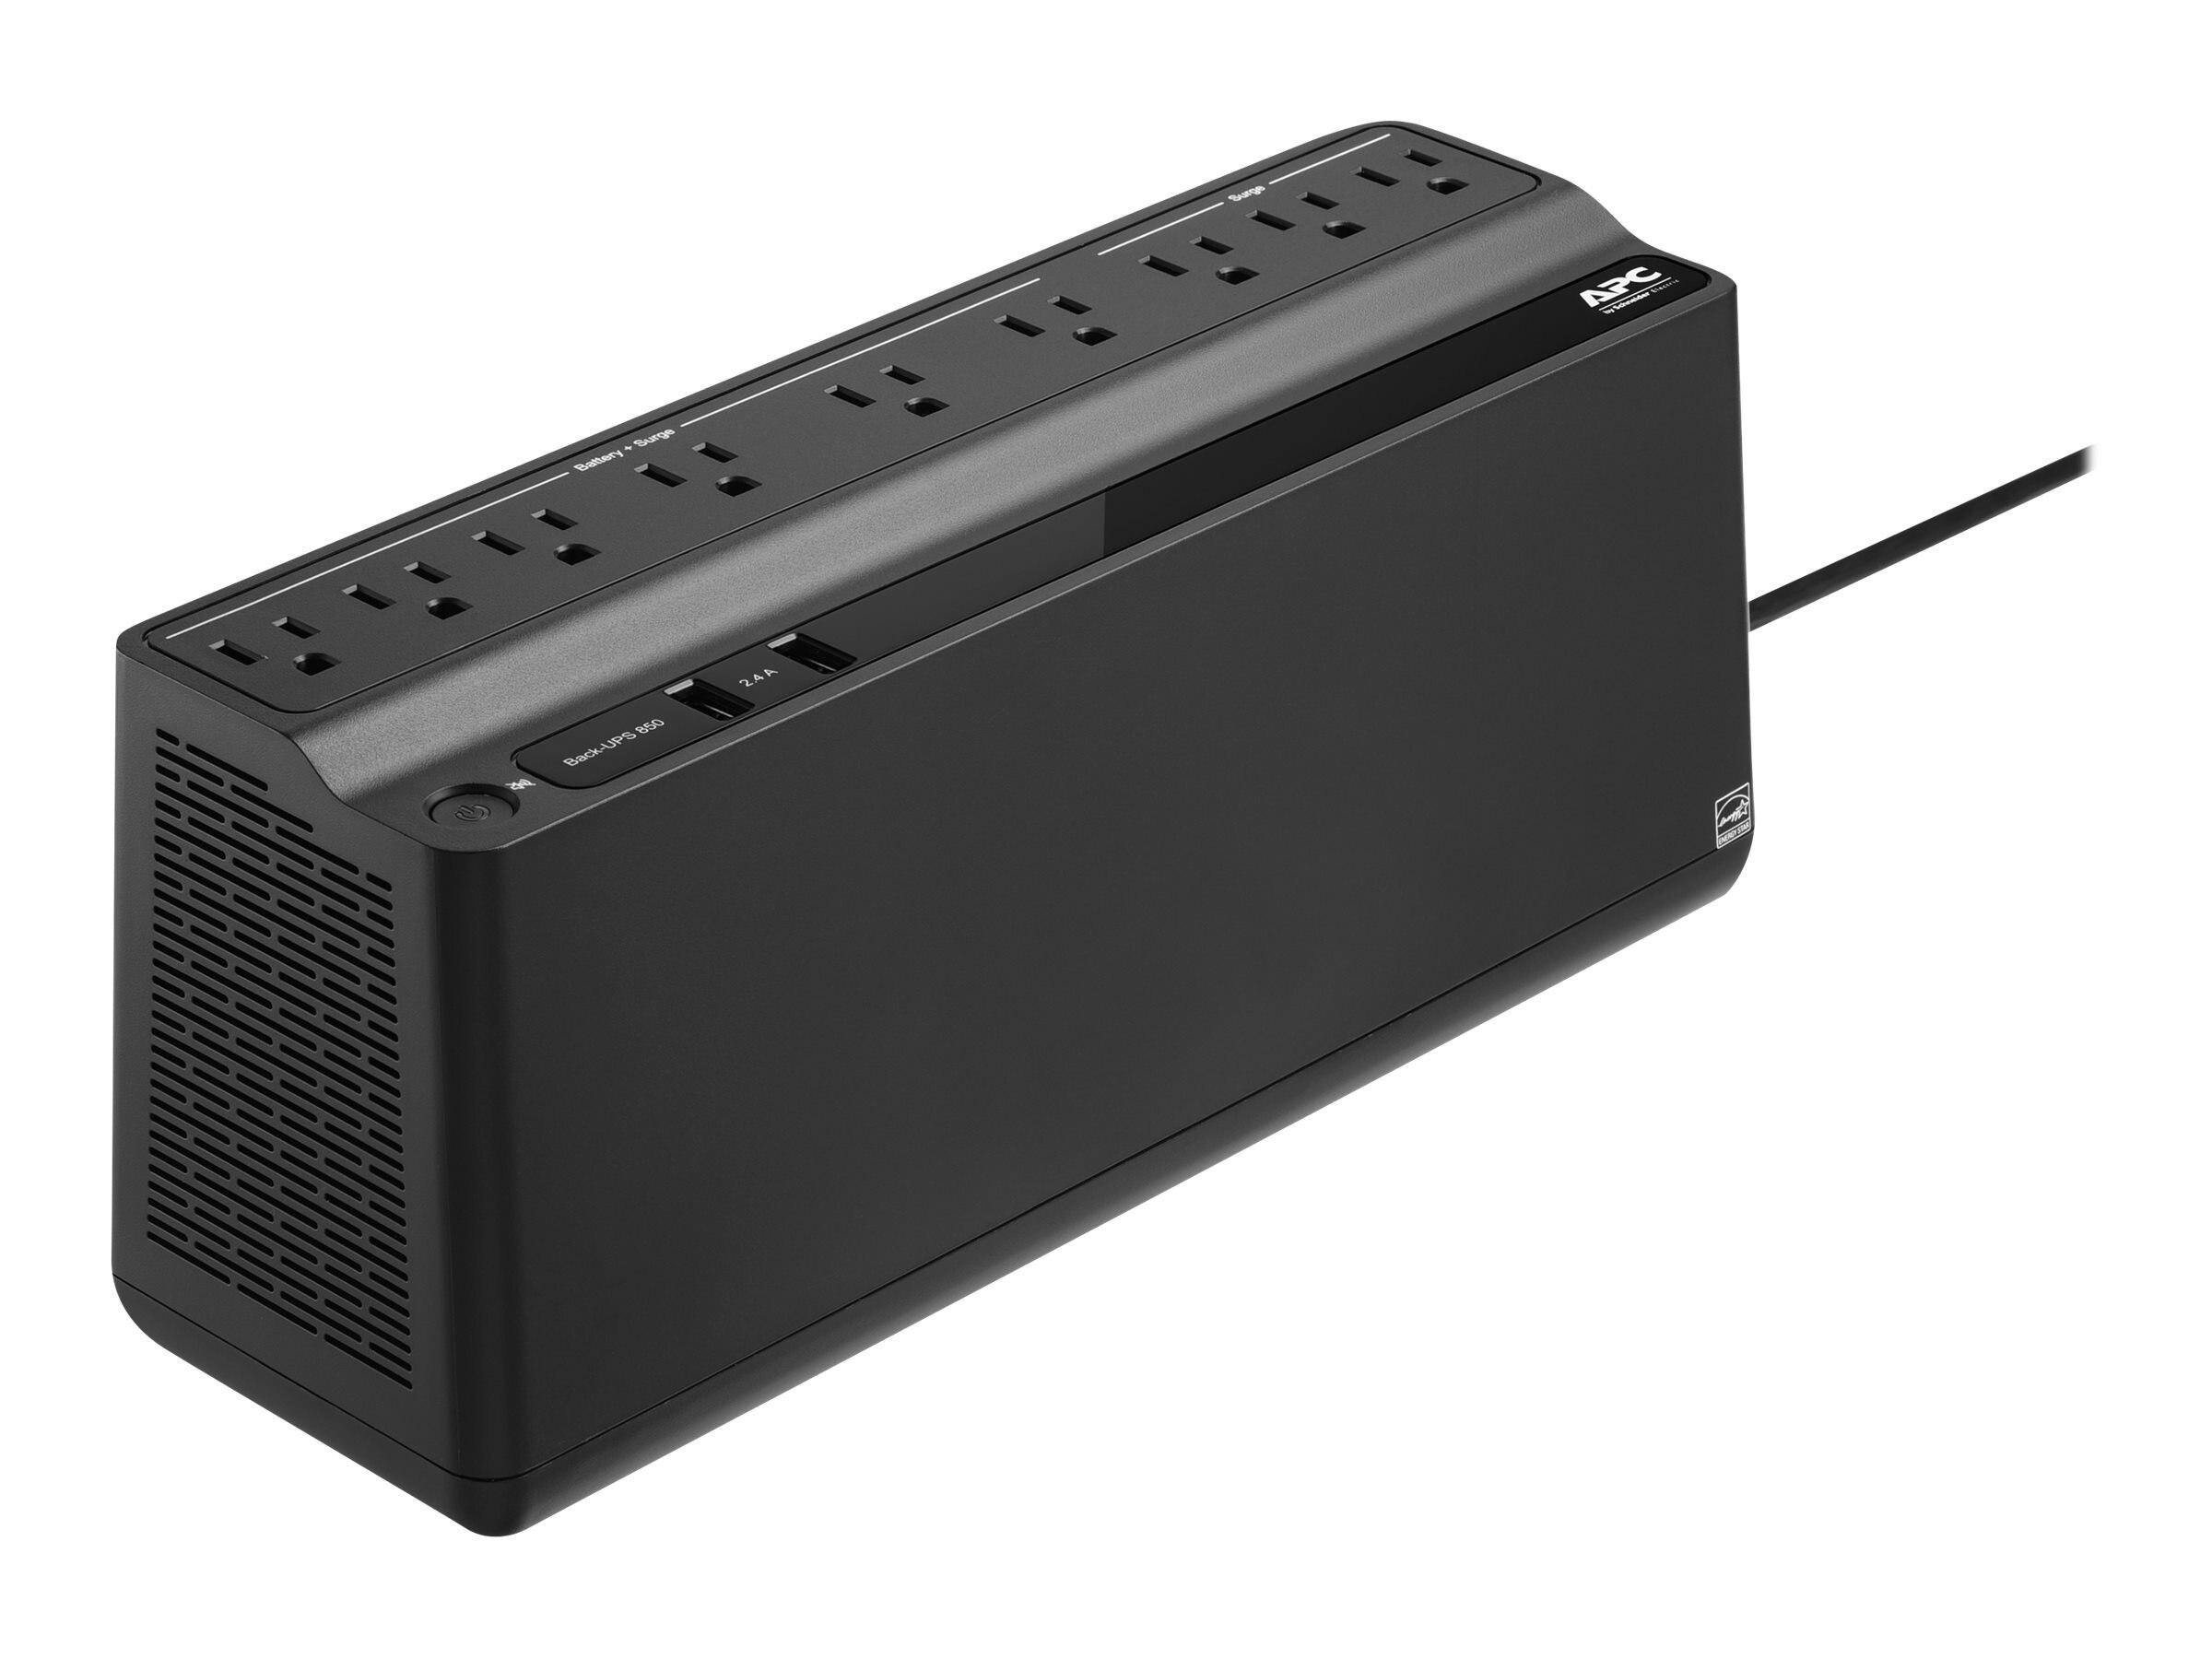 APC Back-UPS 850VA 450W 120V Standby (9) 5-15R Outlets